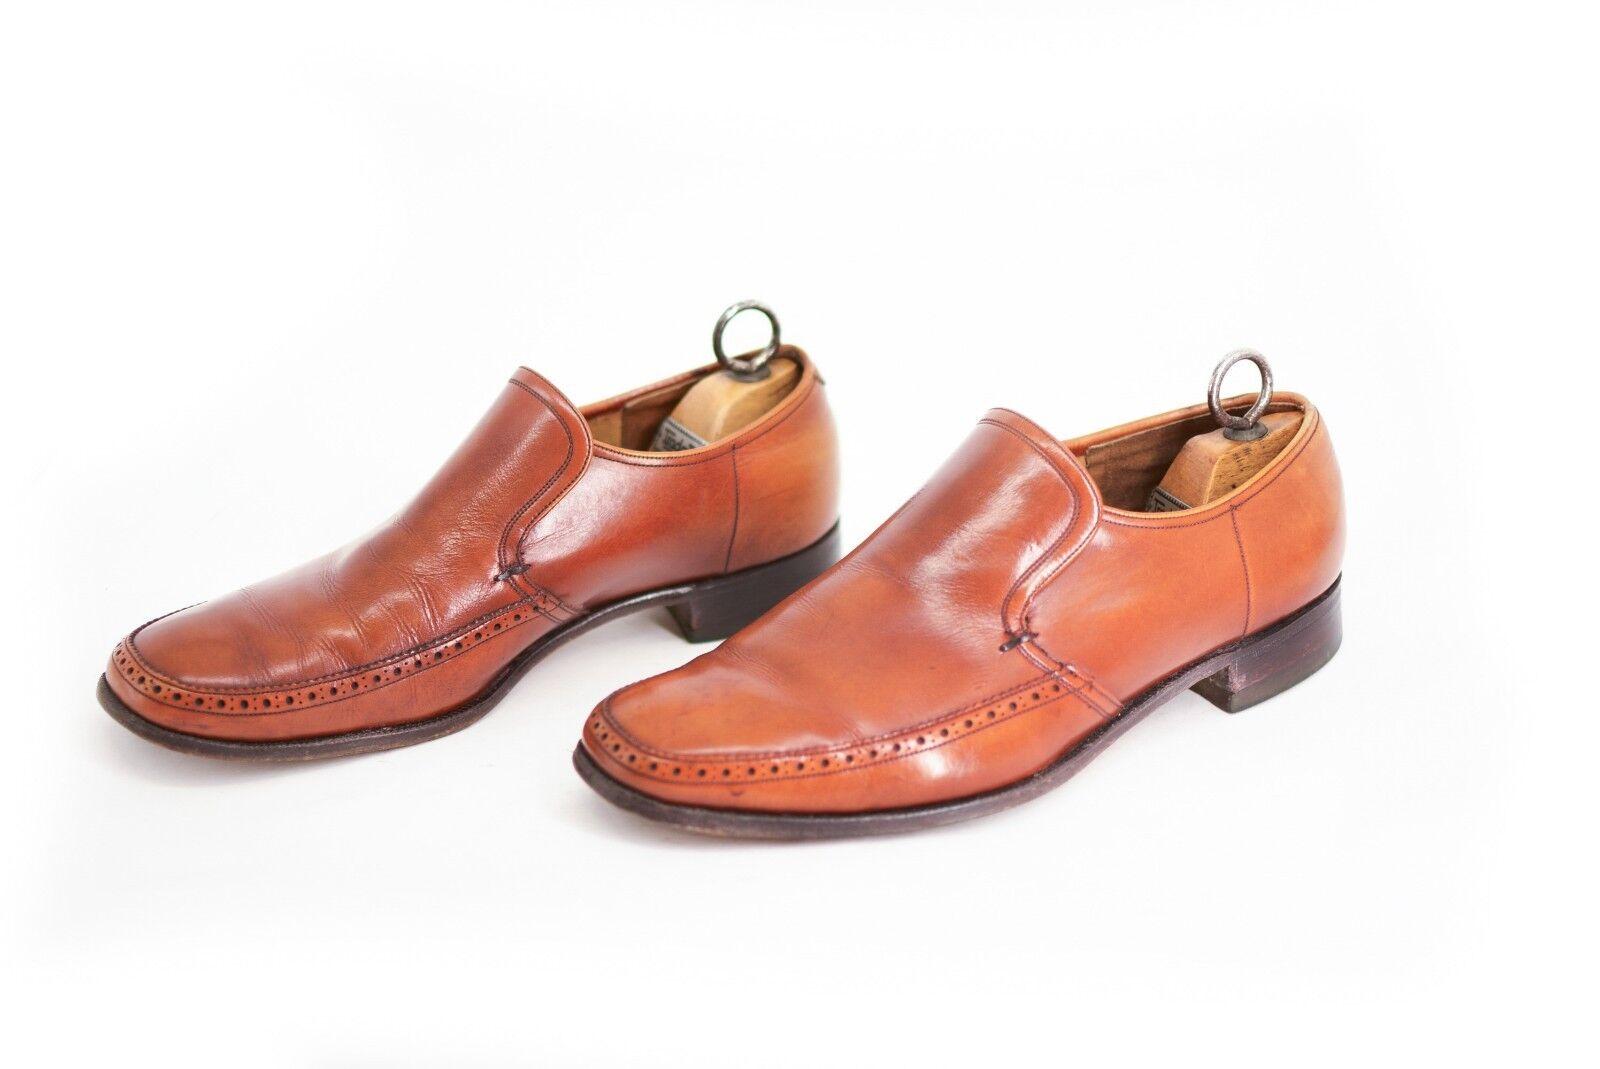 barker vintage conçu par william barker chaussures taille 9